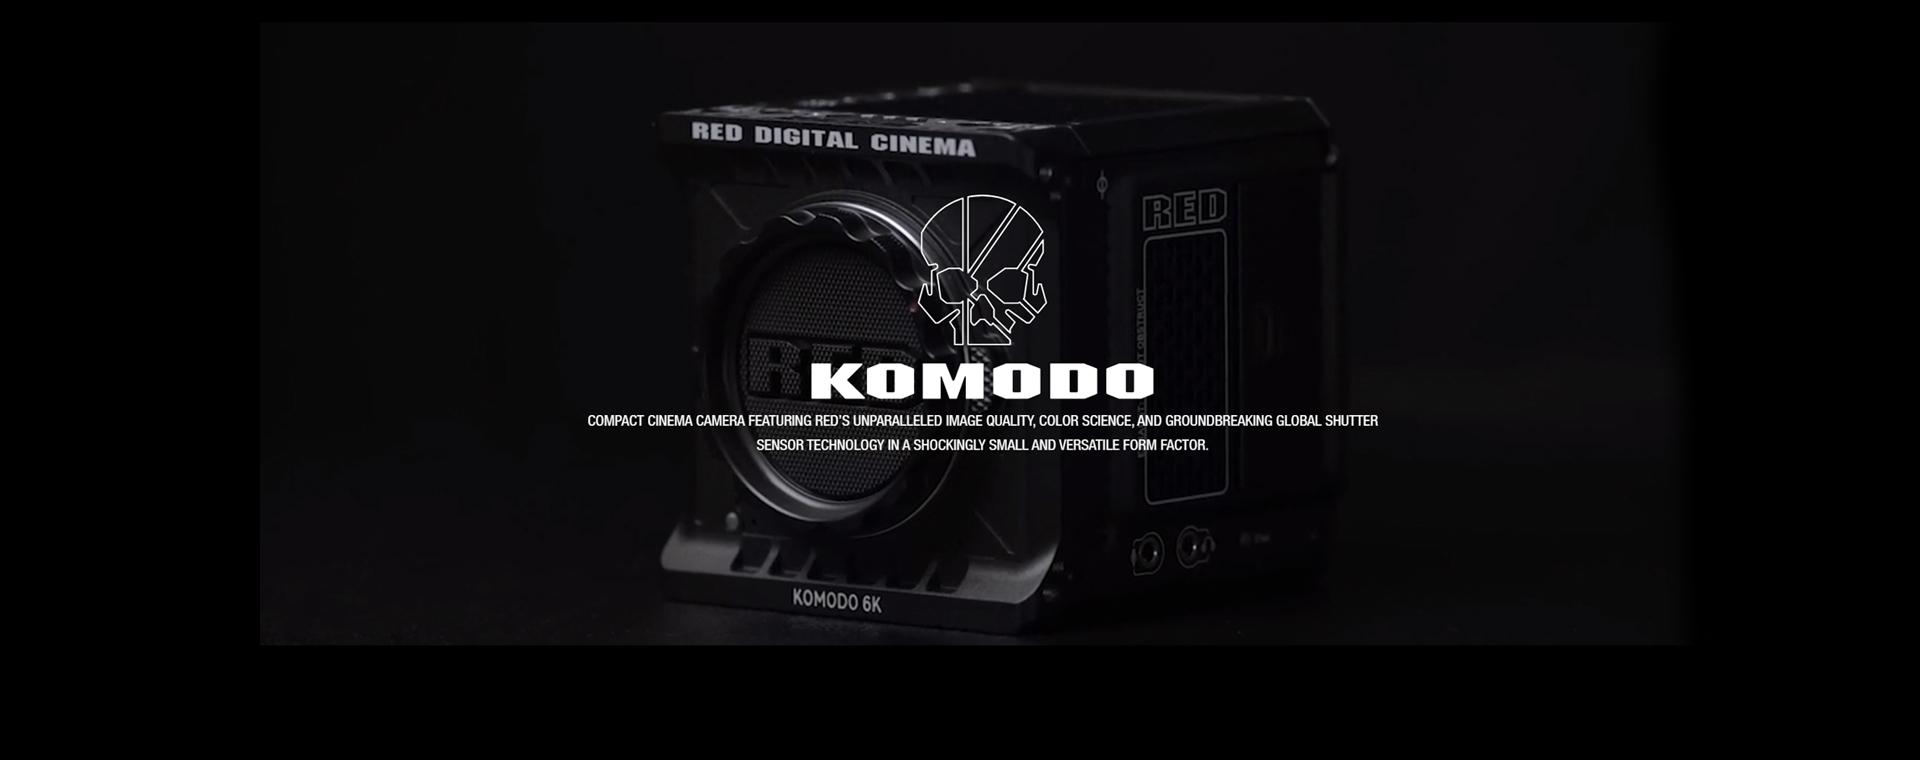 Komodo 6K RED Camera